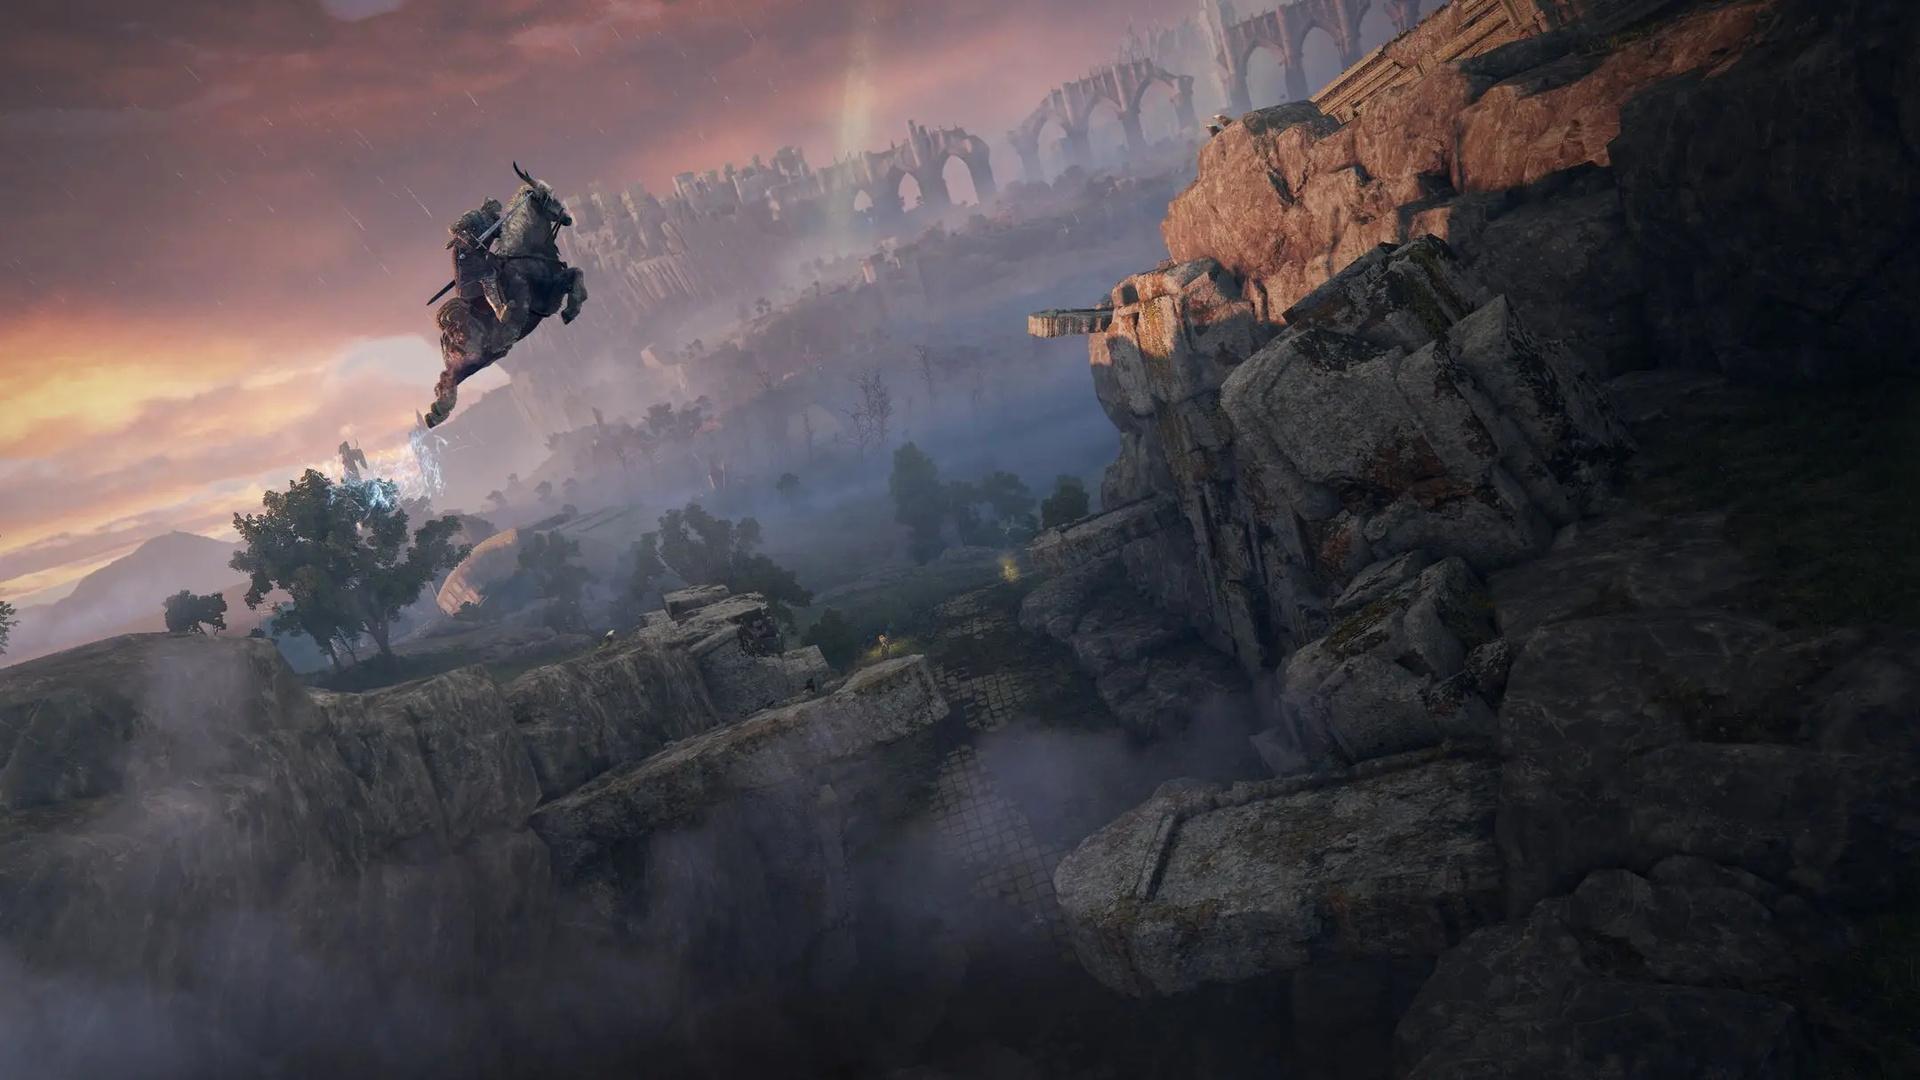 Elden Ring E3 2021 game announcement press image